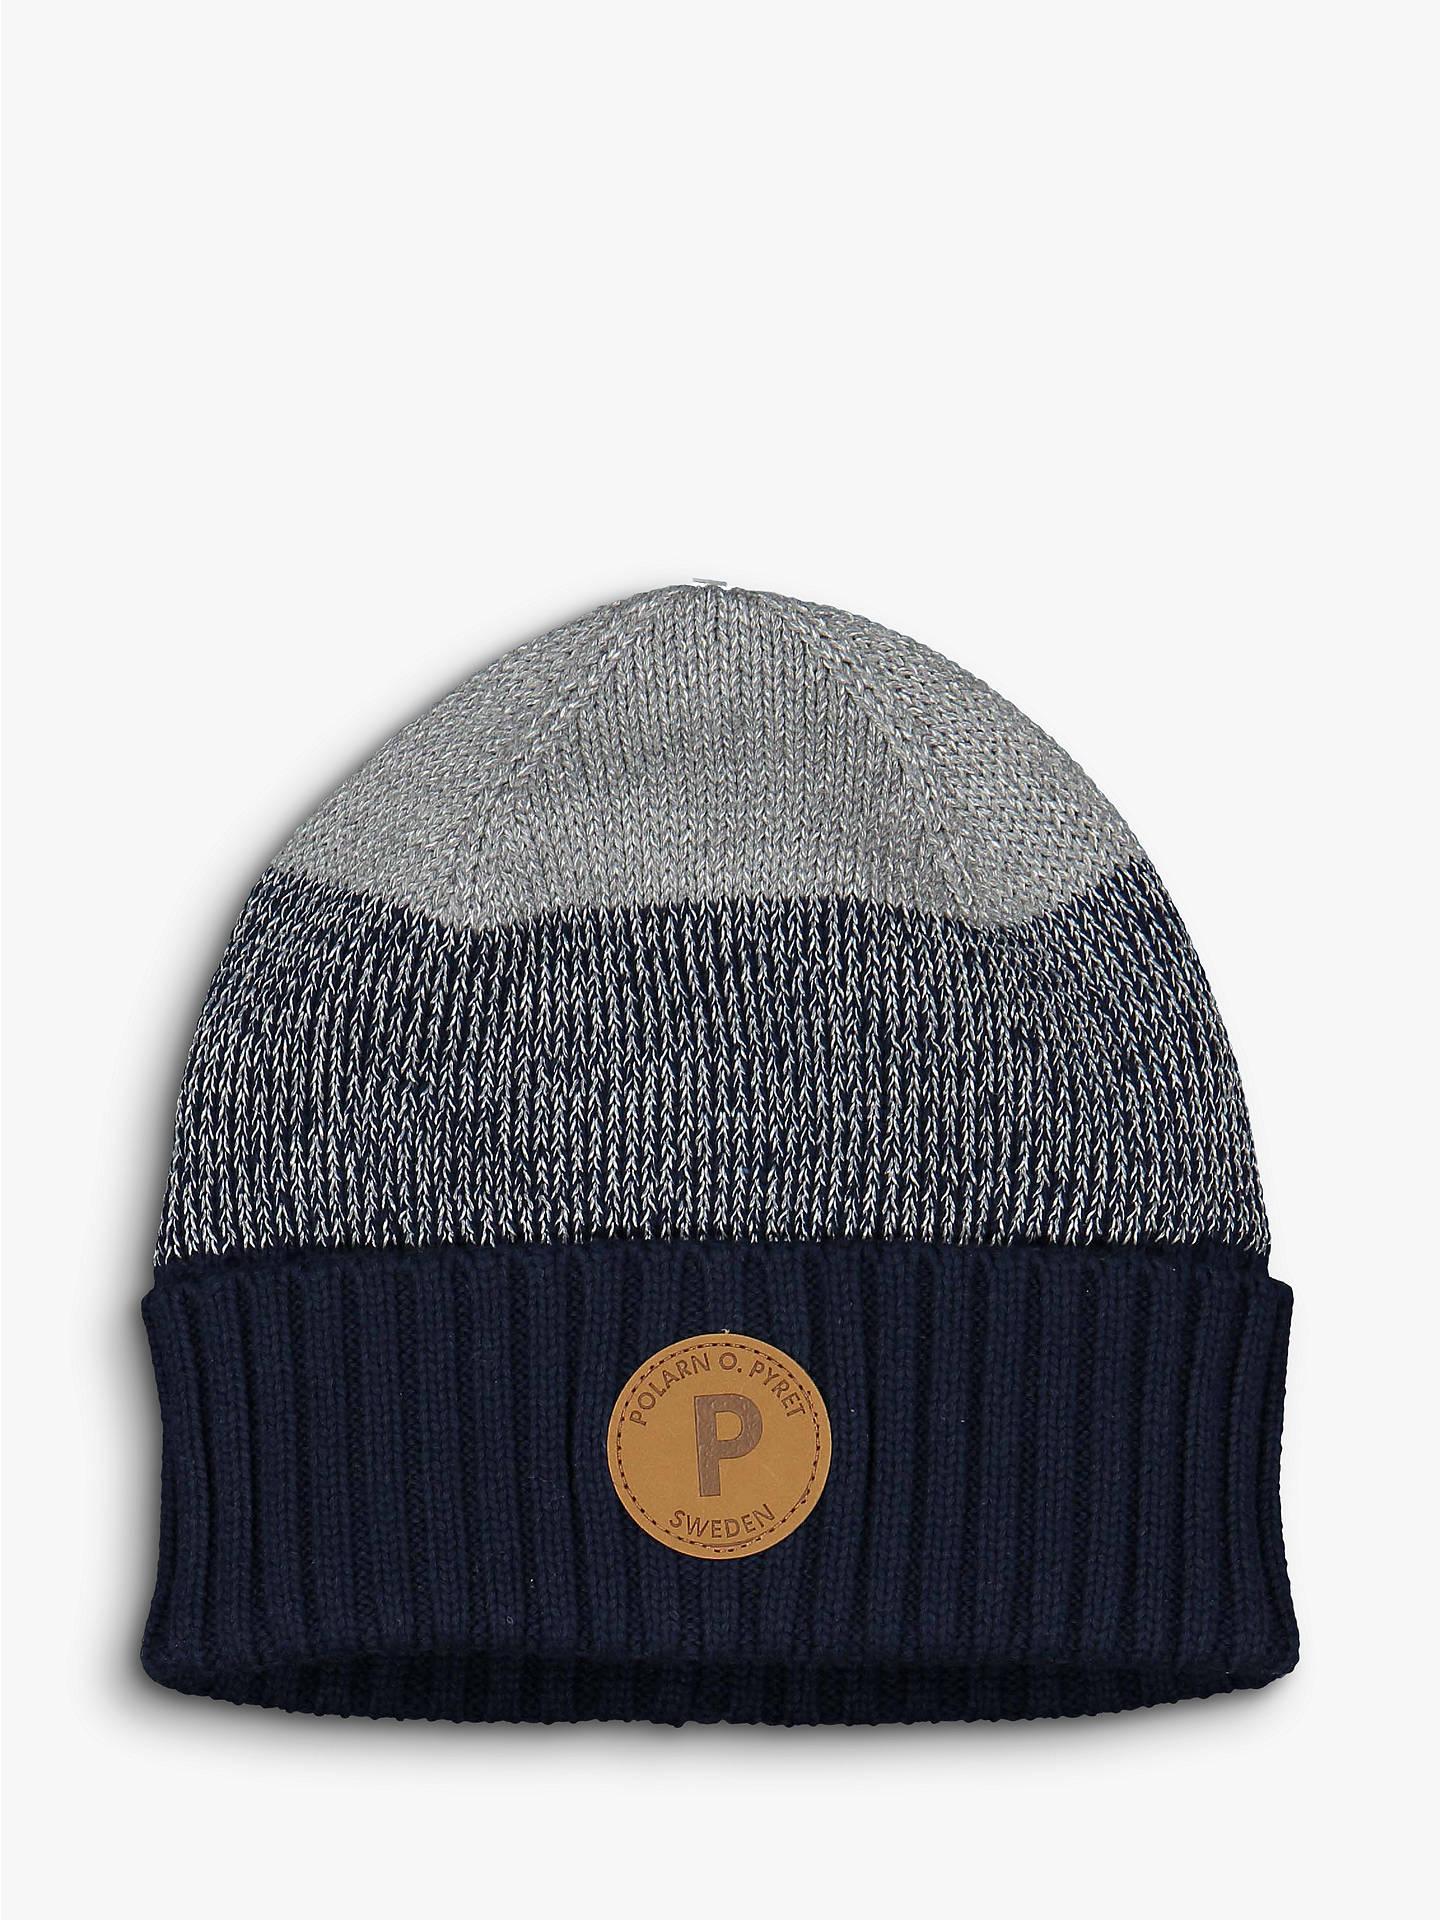 Polarn O Pyret Boys Age 2-12Y Girls Was  £20. Kids Reflective Beanie Hat